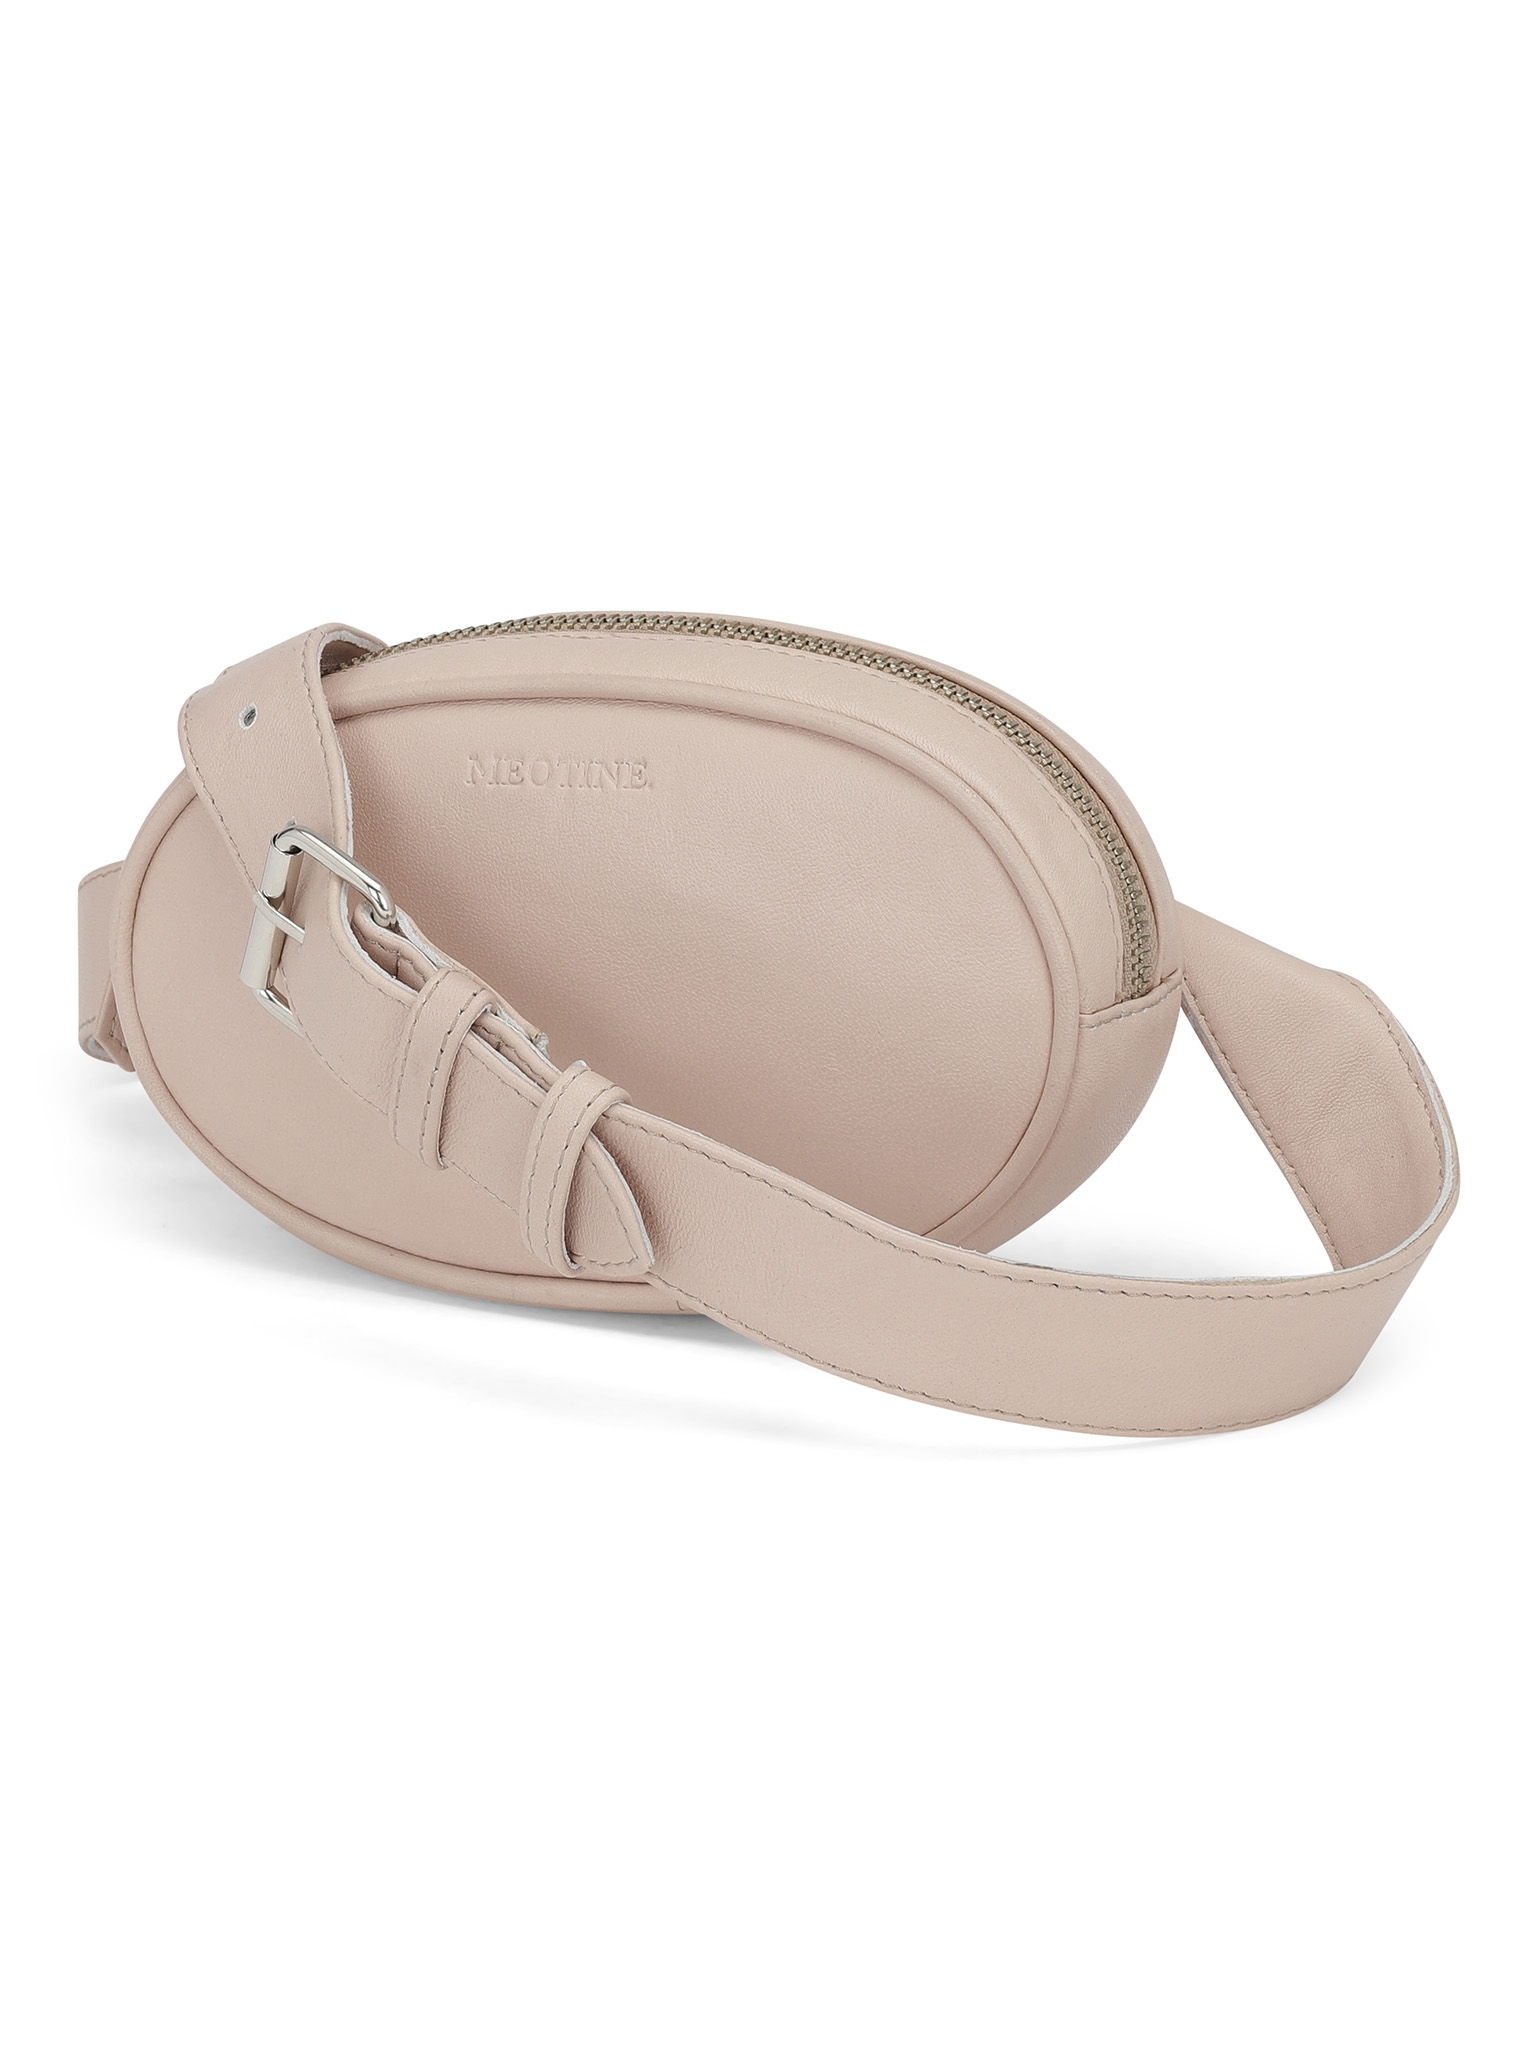 Meotine Leather Bum Bag, Pink